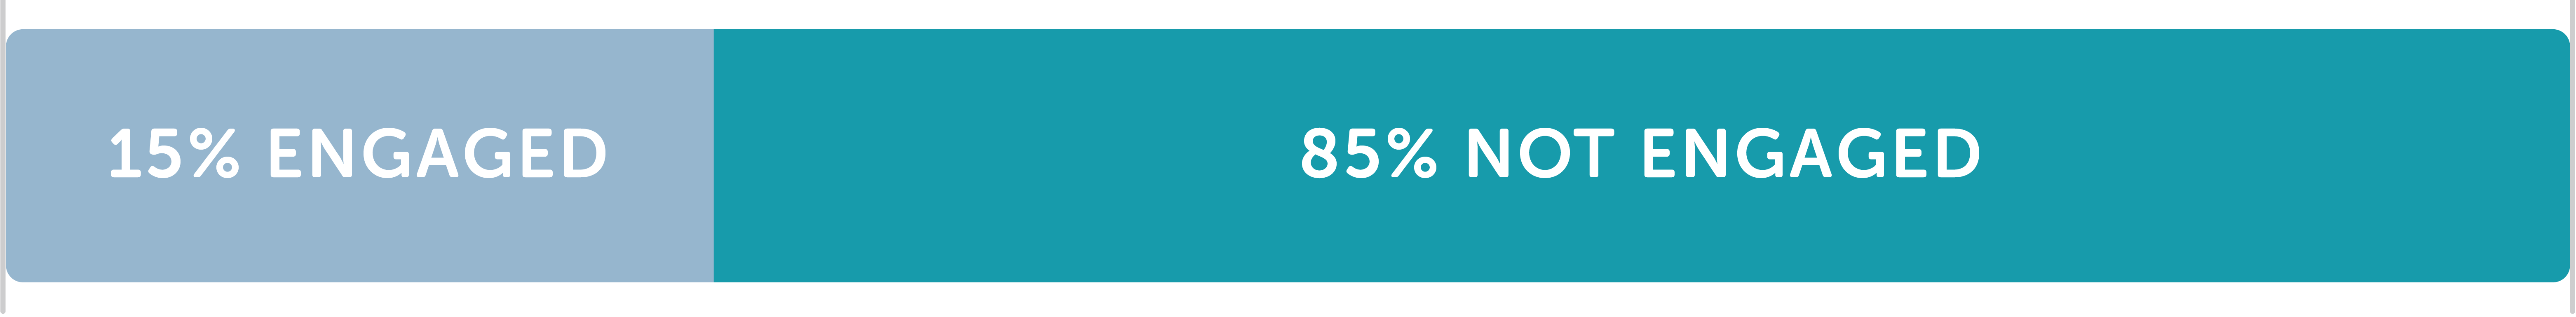 Workforce-engagement-percent-graph